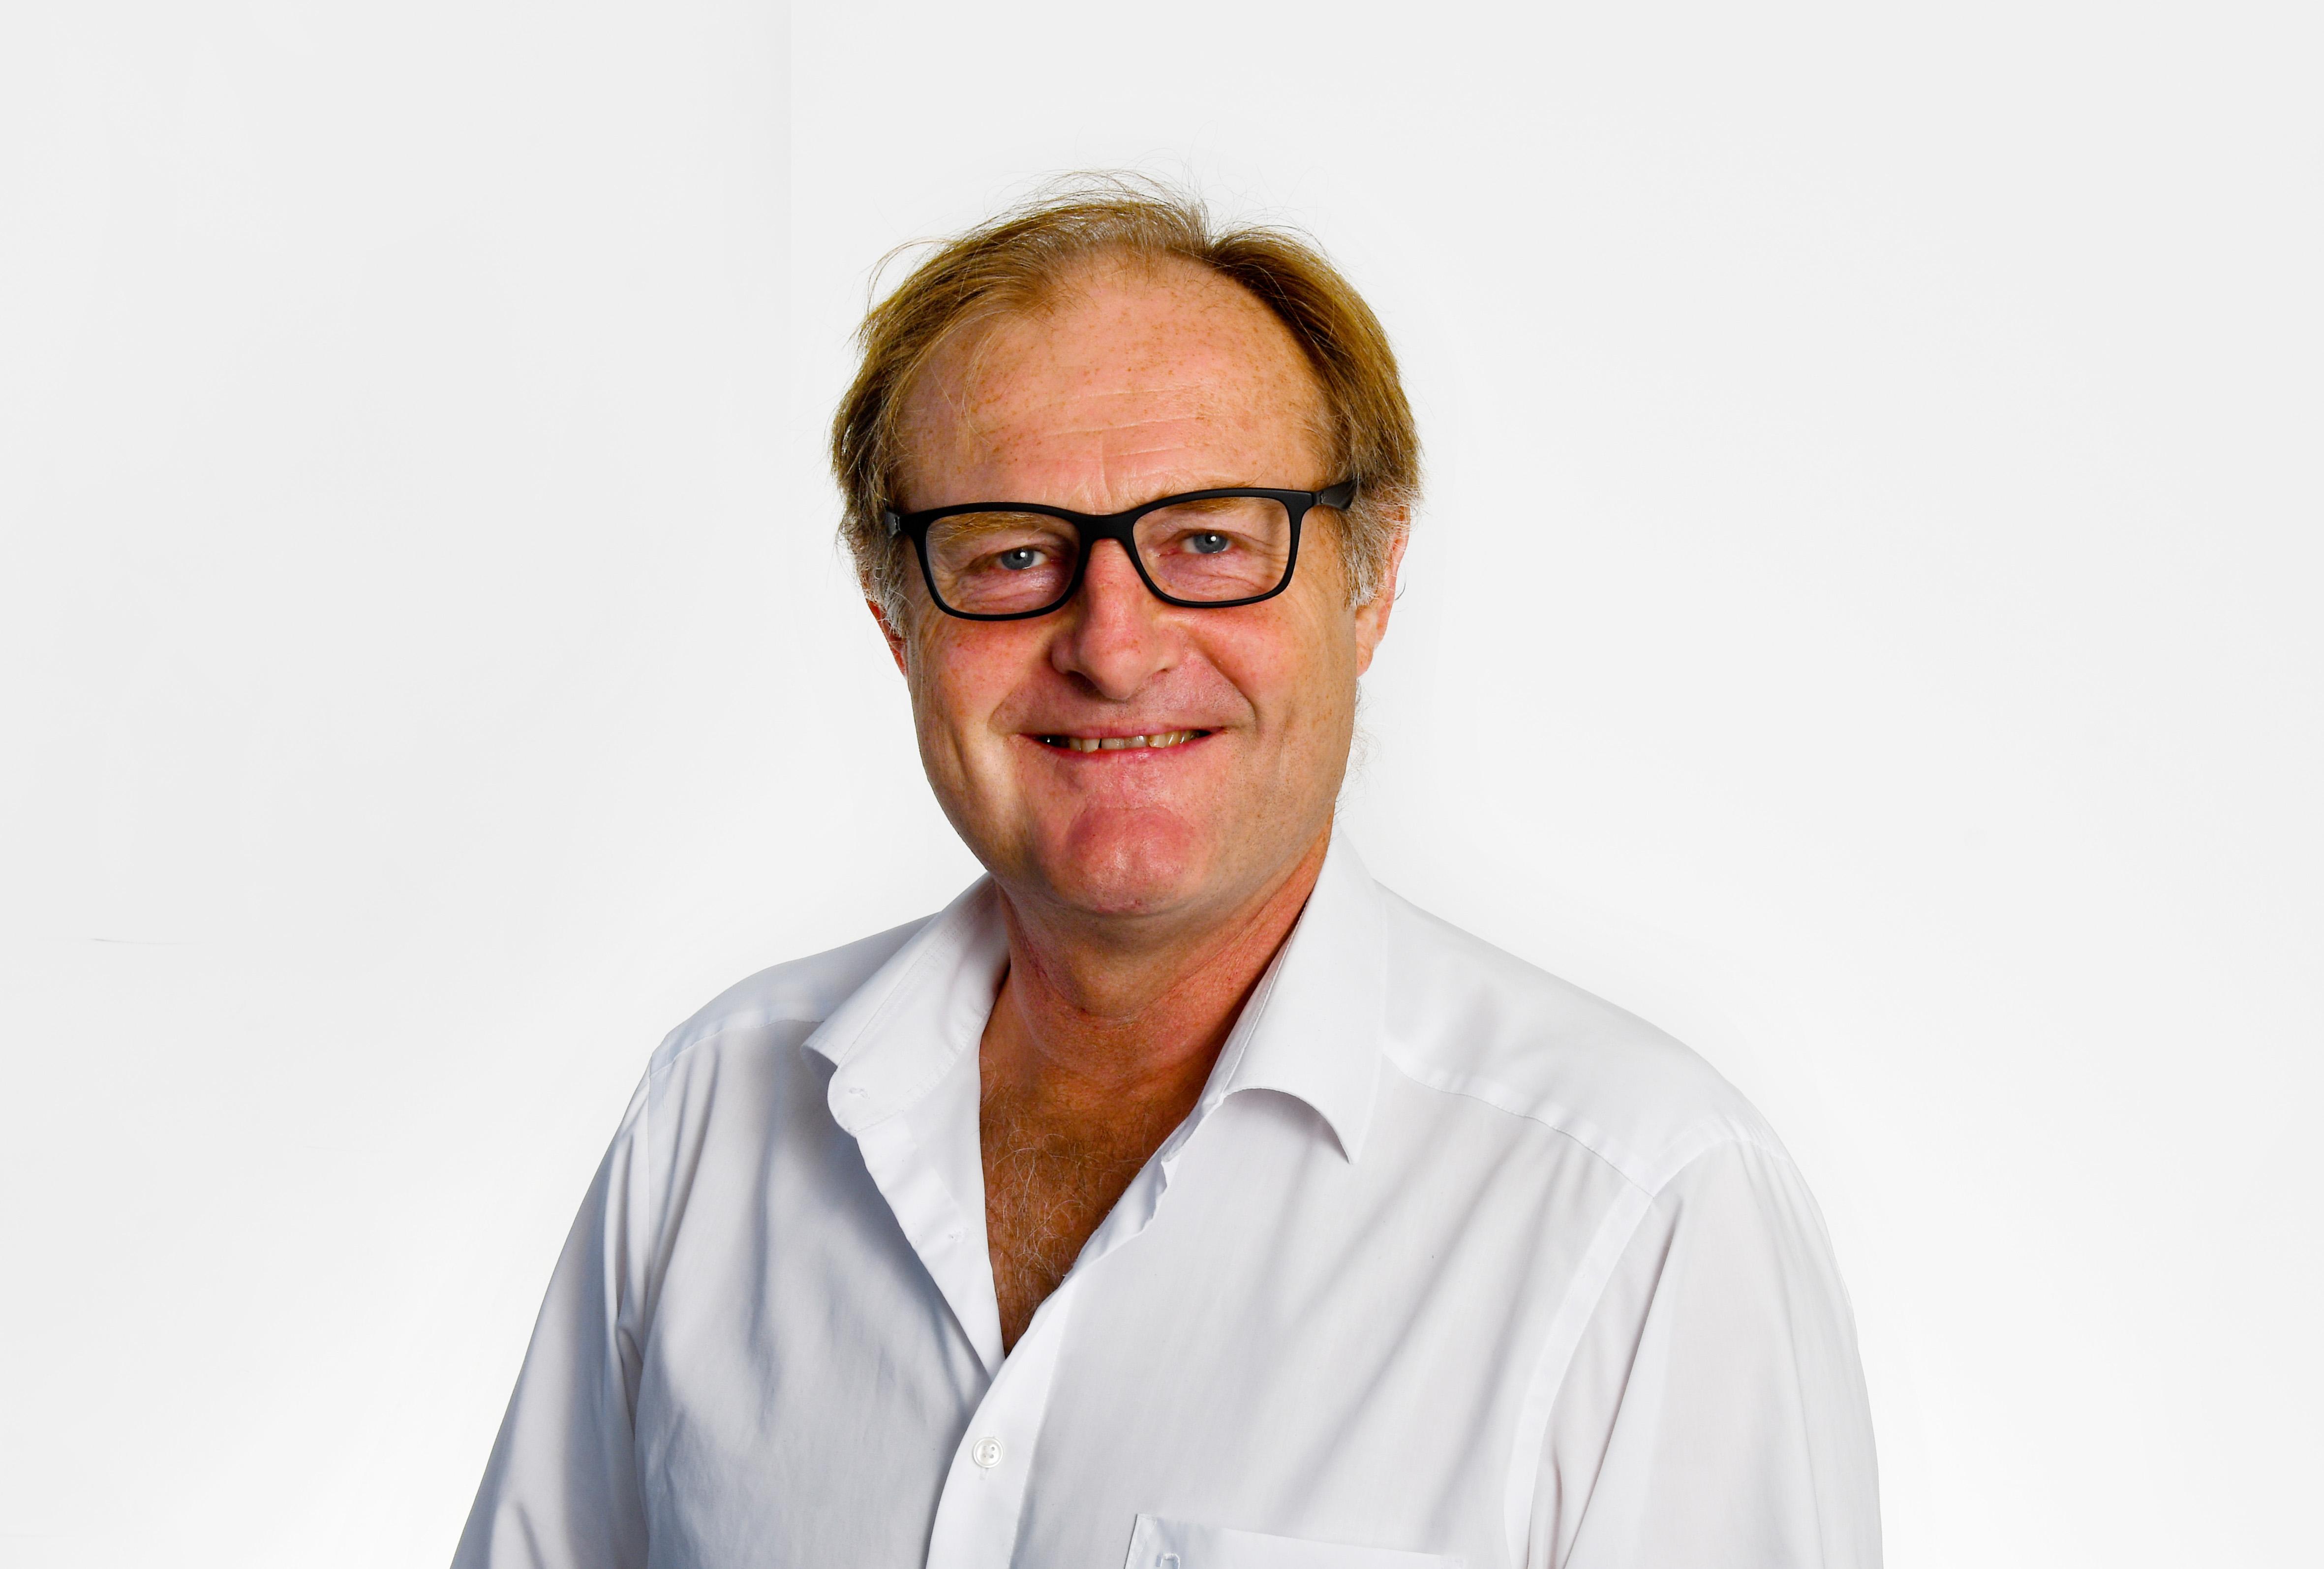 Nils Thaden